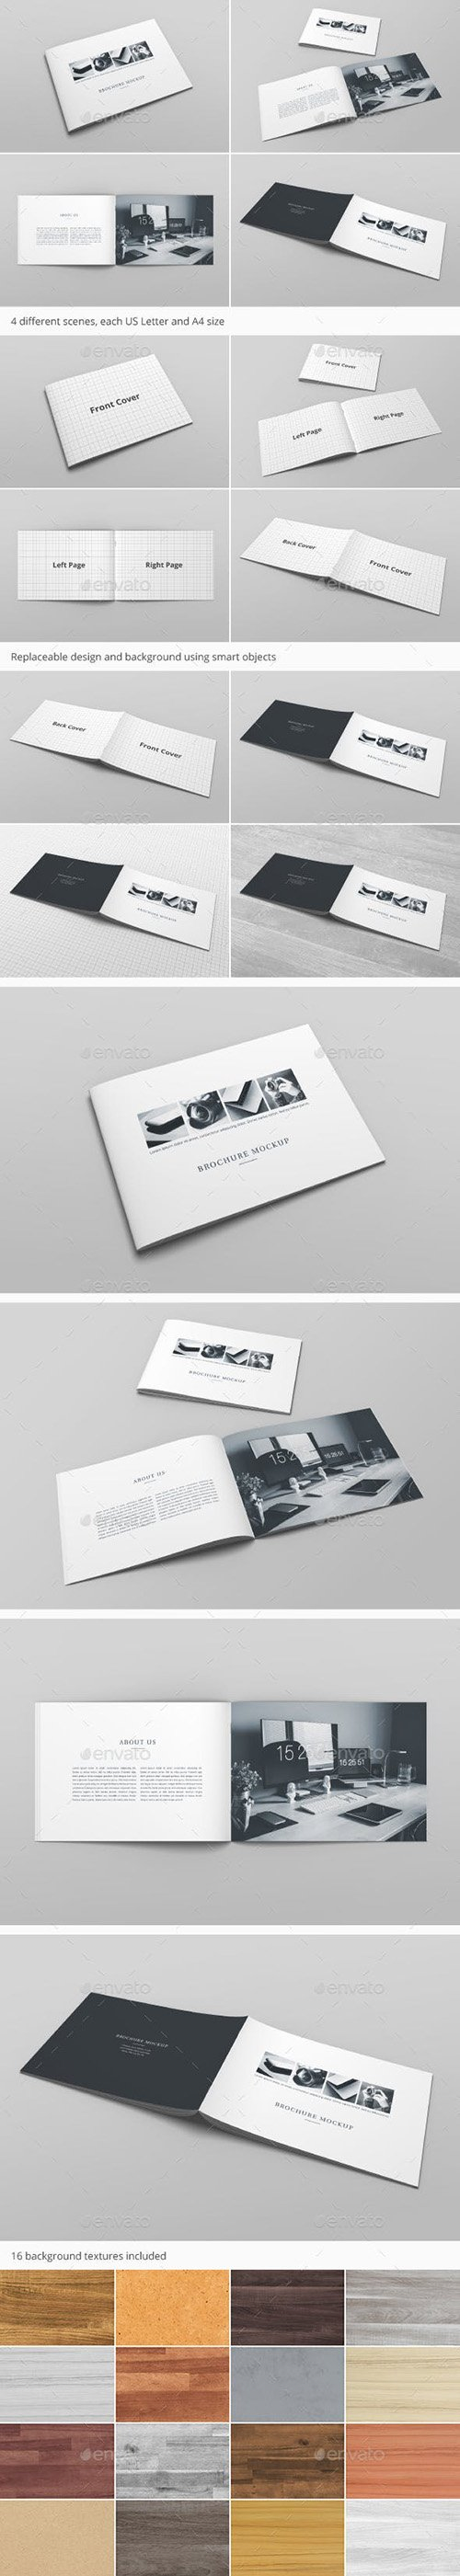 GR - Brochure Catalog Mockup Vol. 1 21420388